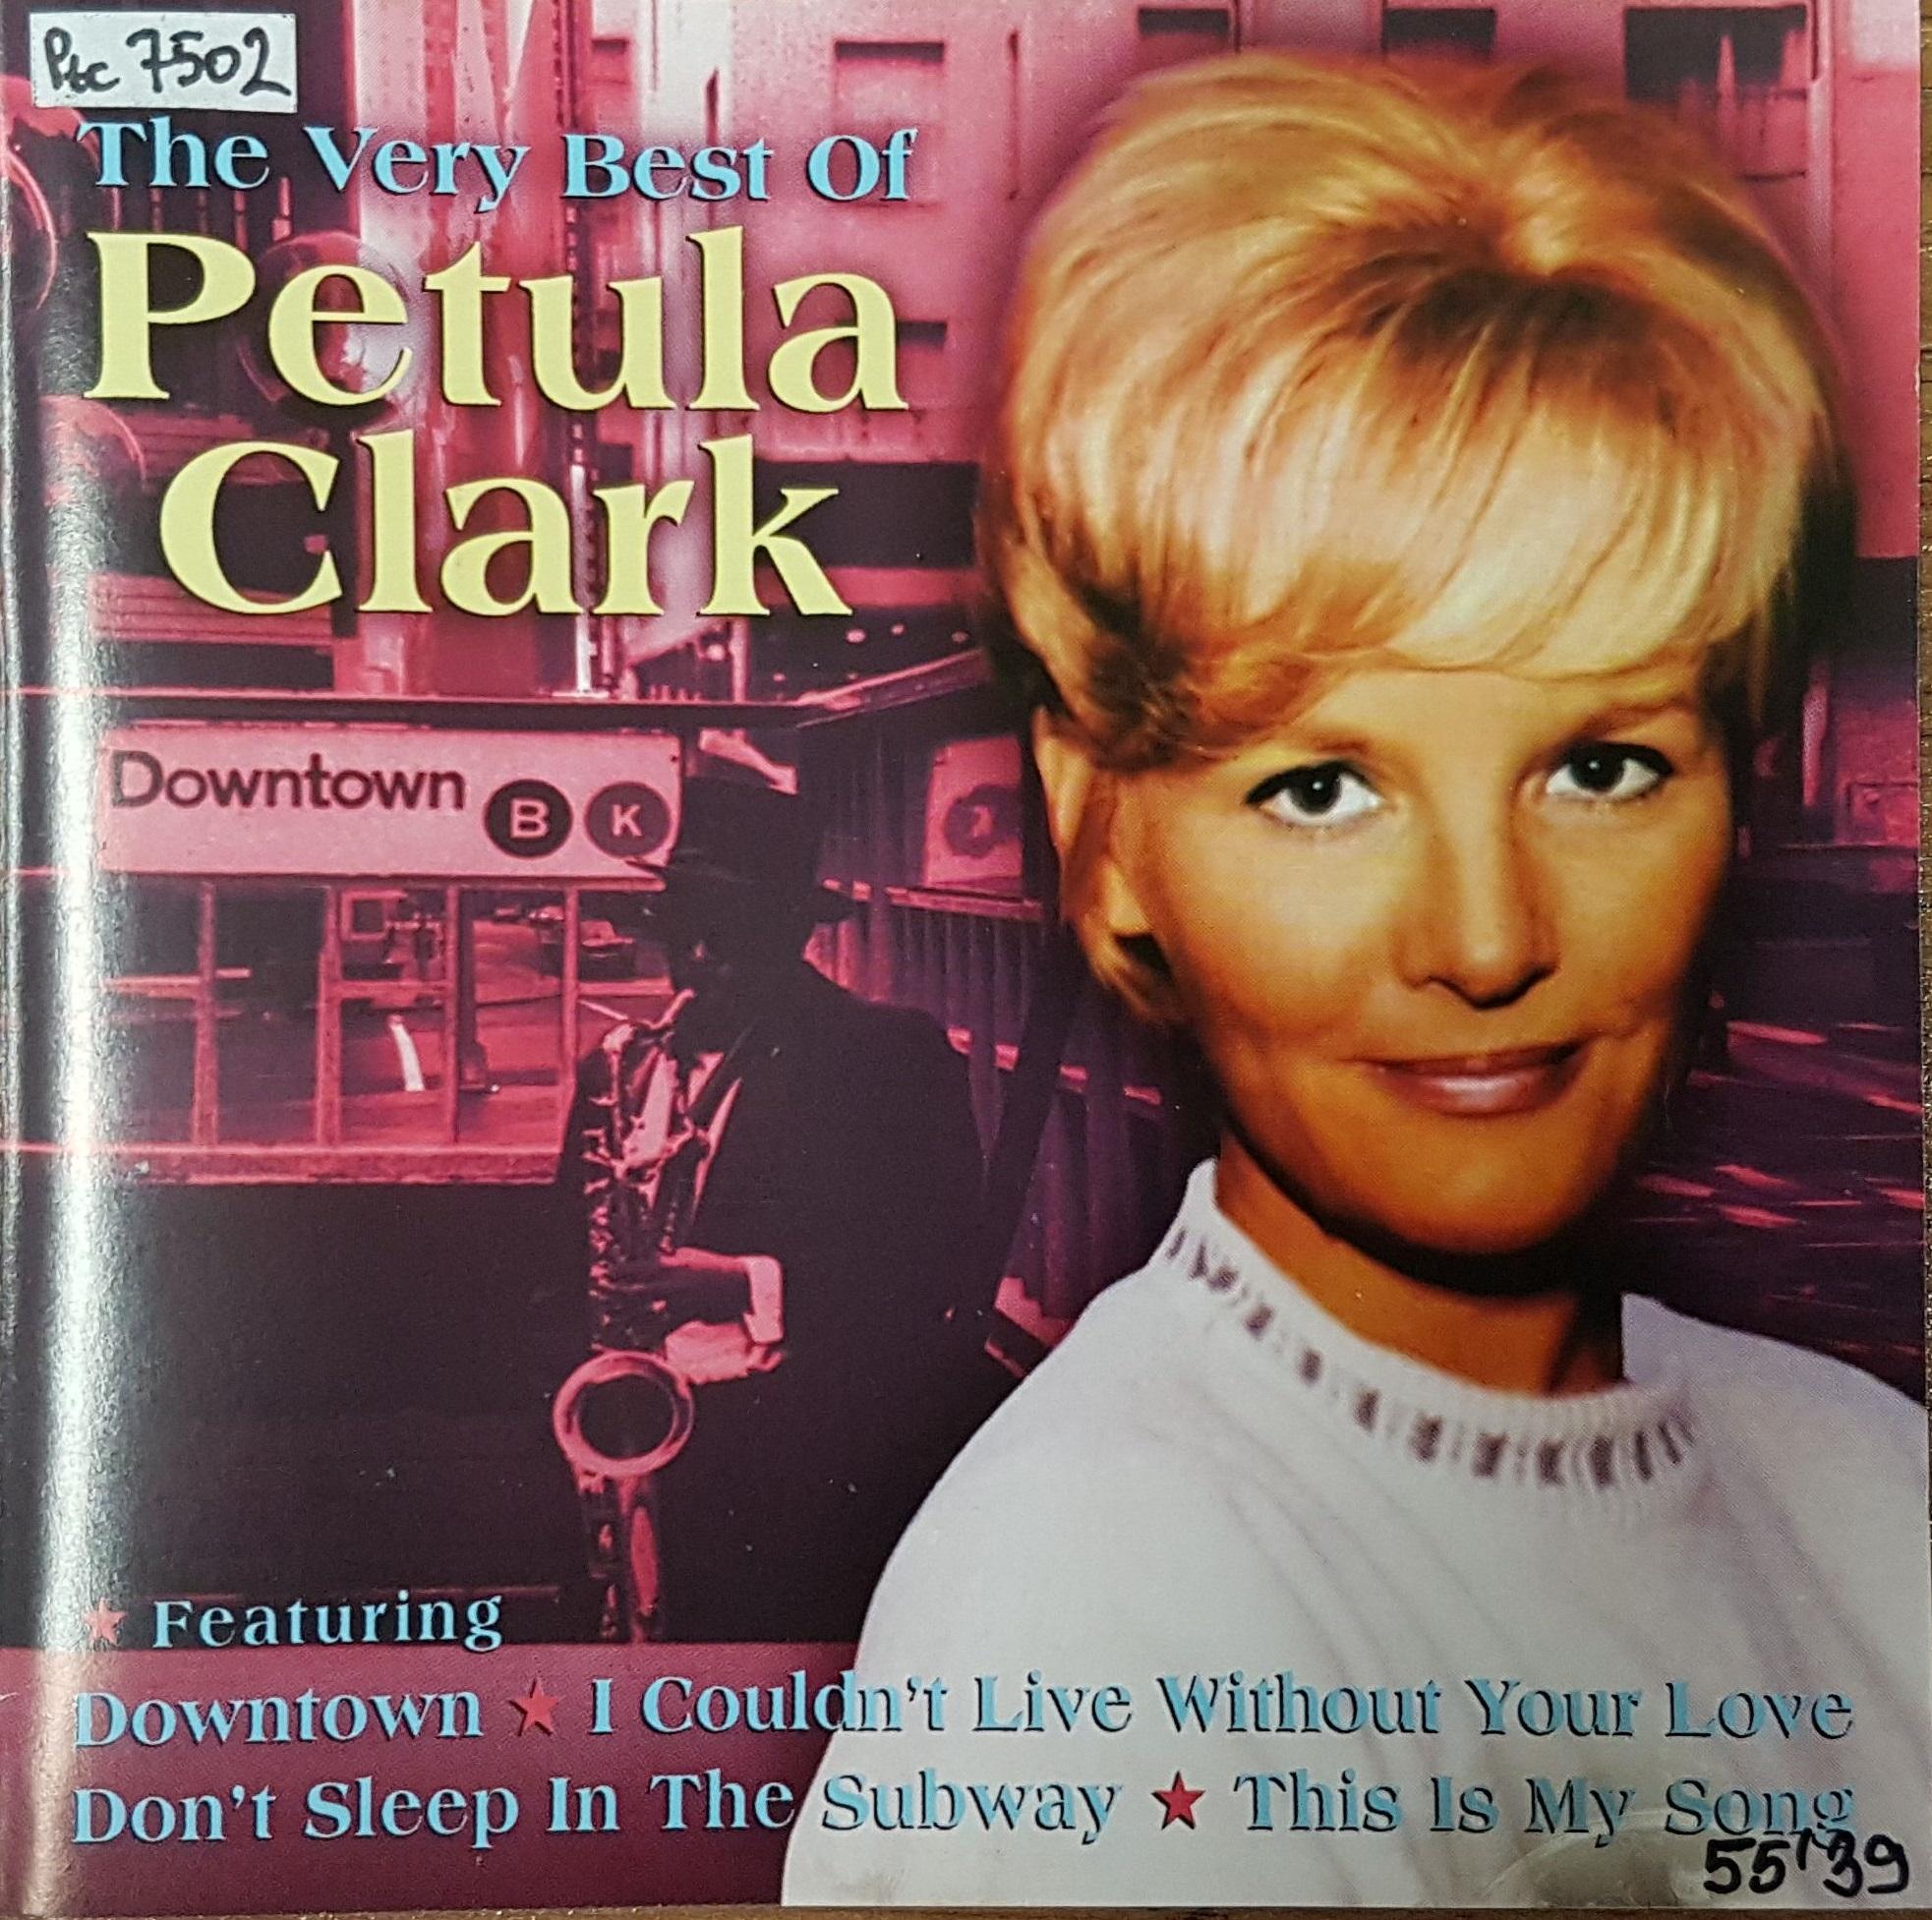 Clark Petula – Best Of